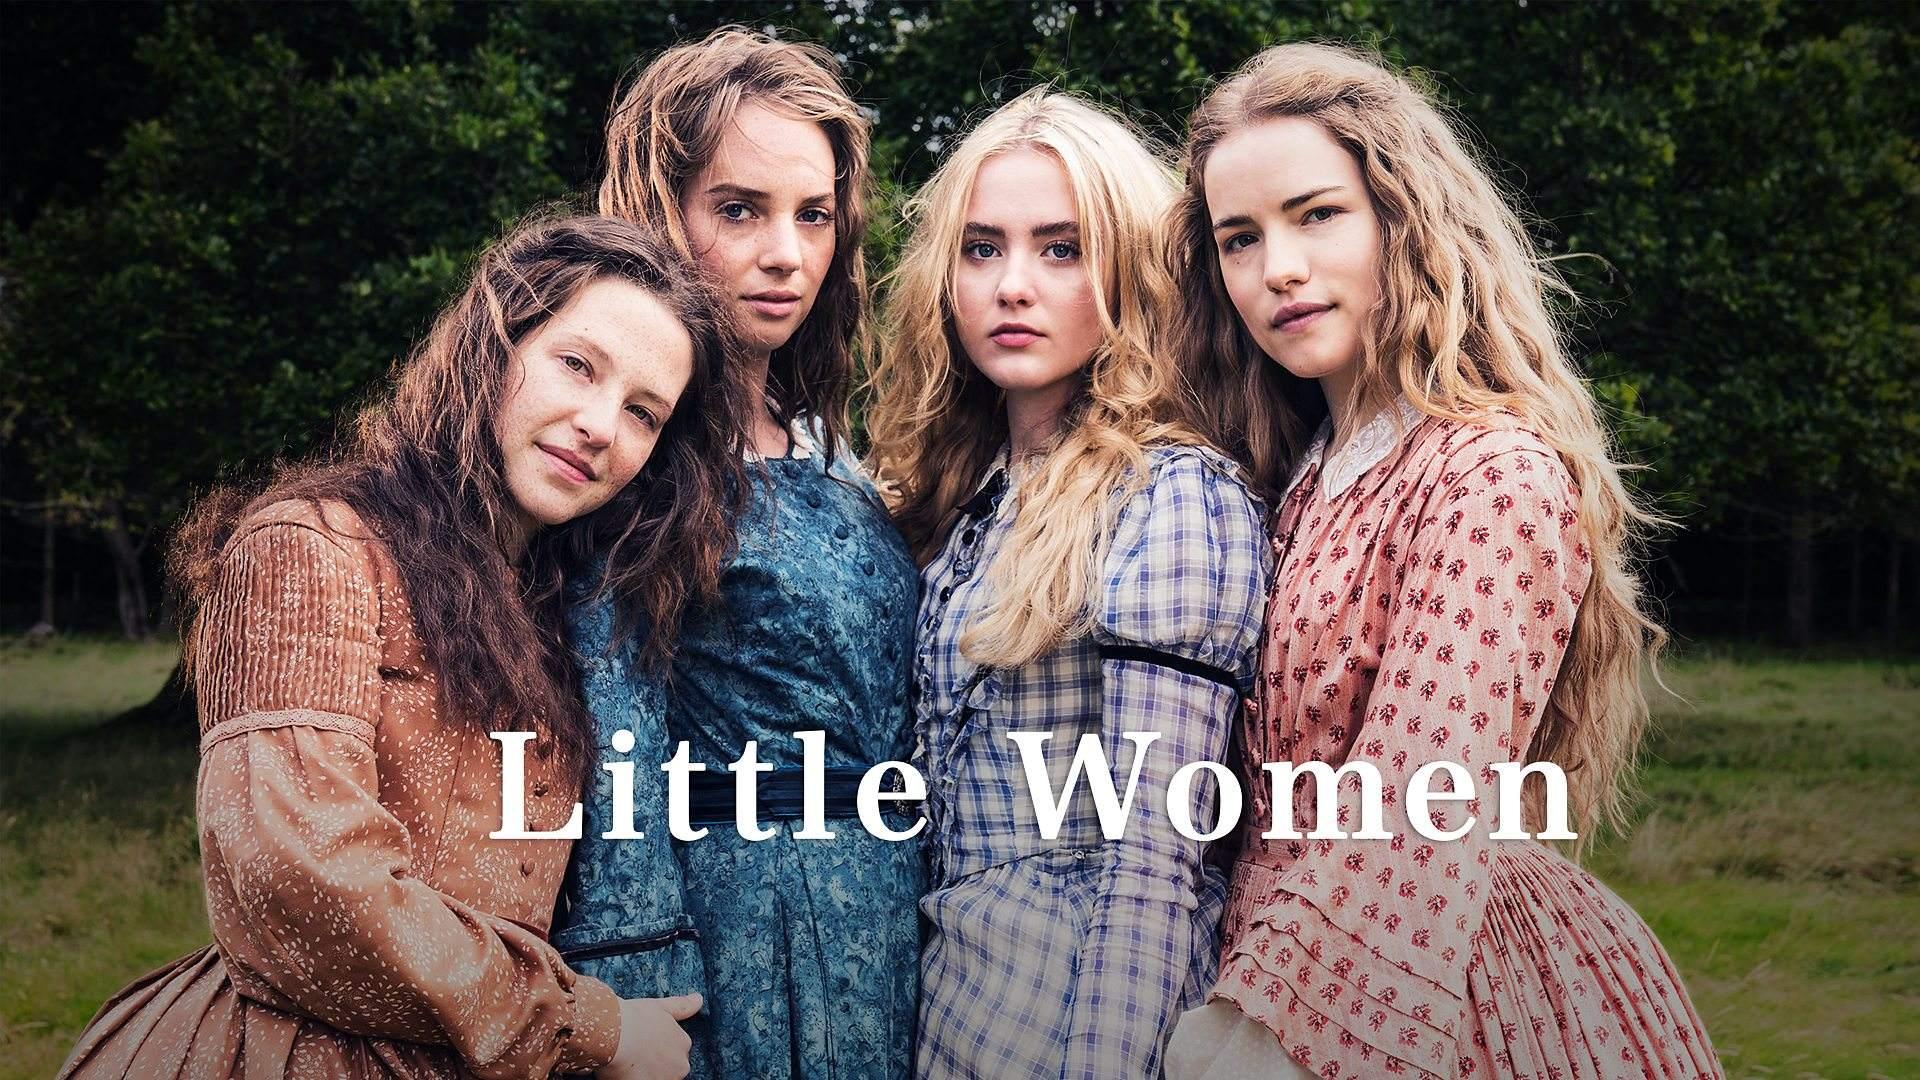 little women,小妇人,essay代写,paper代写,作业代写